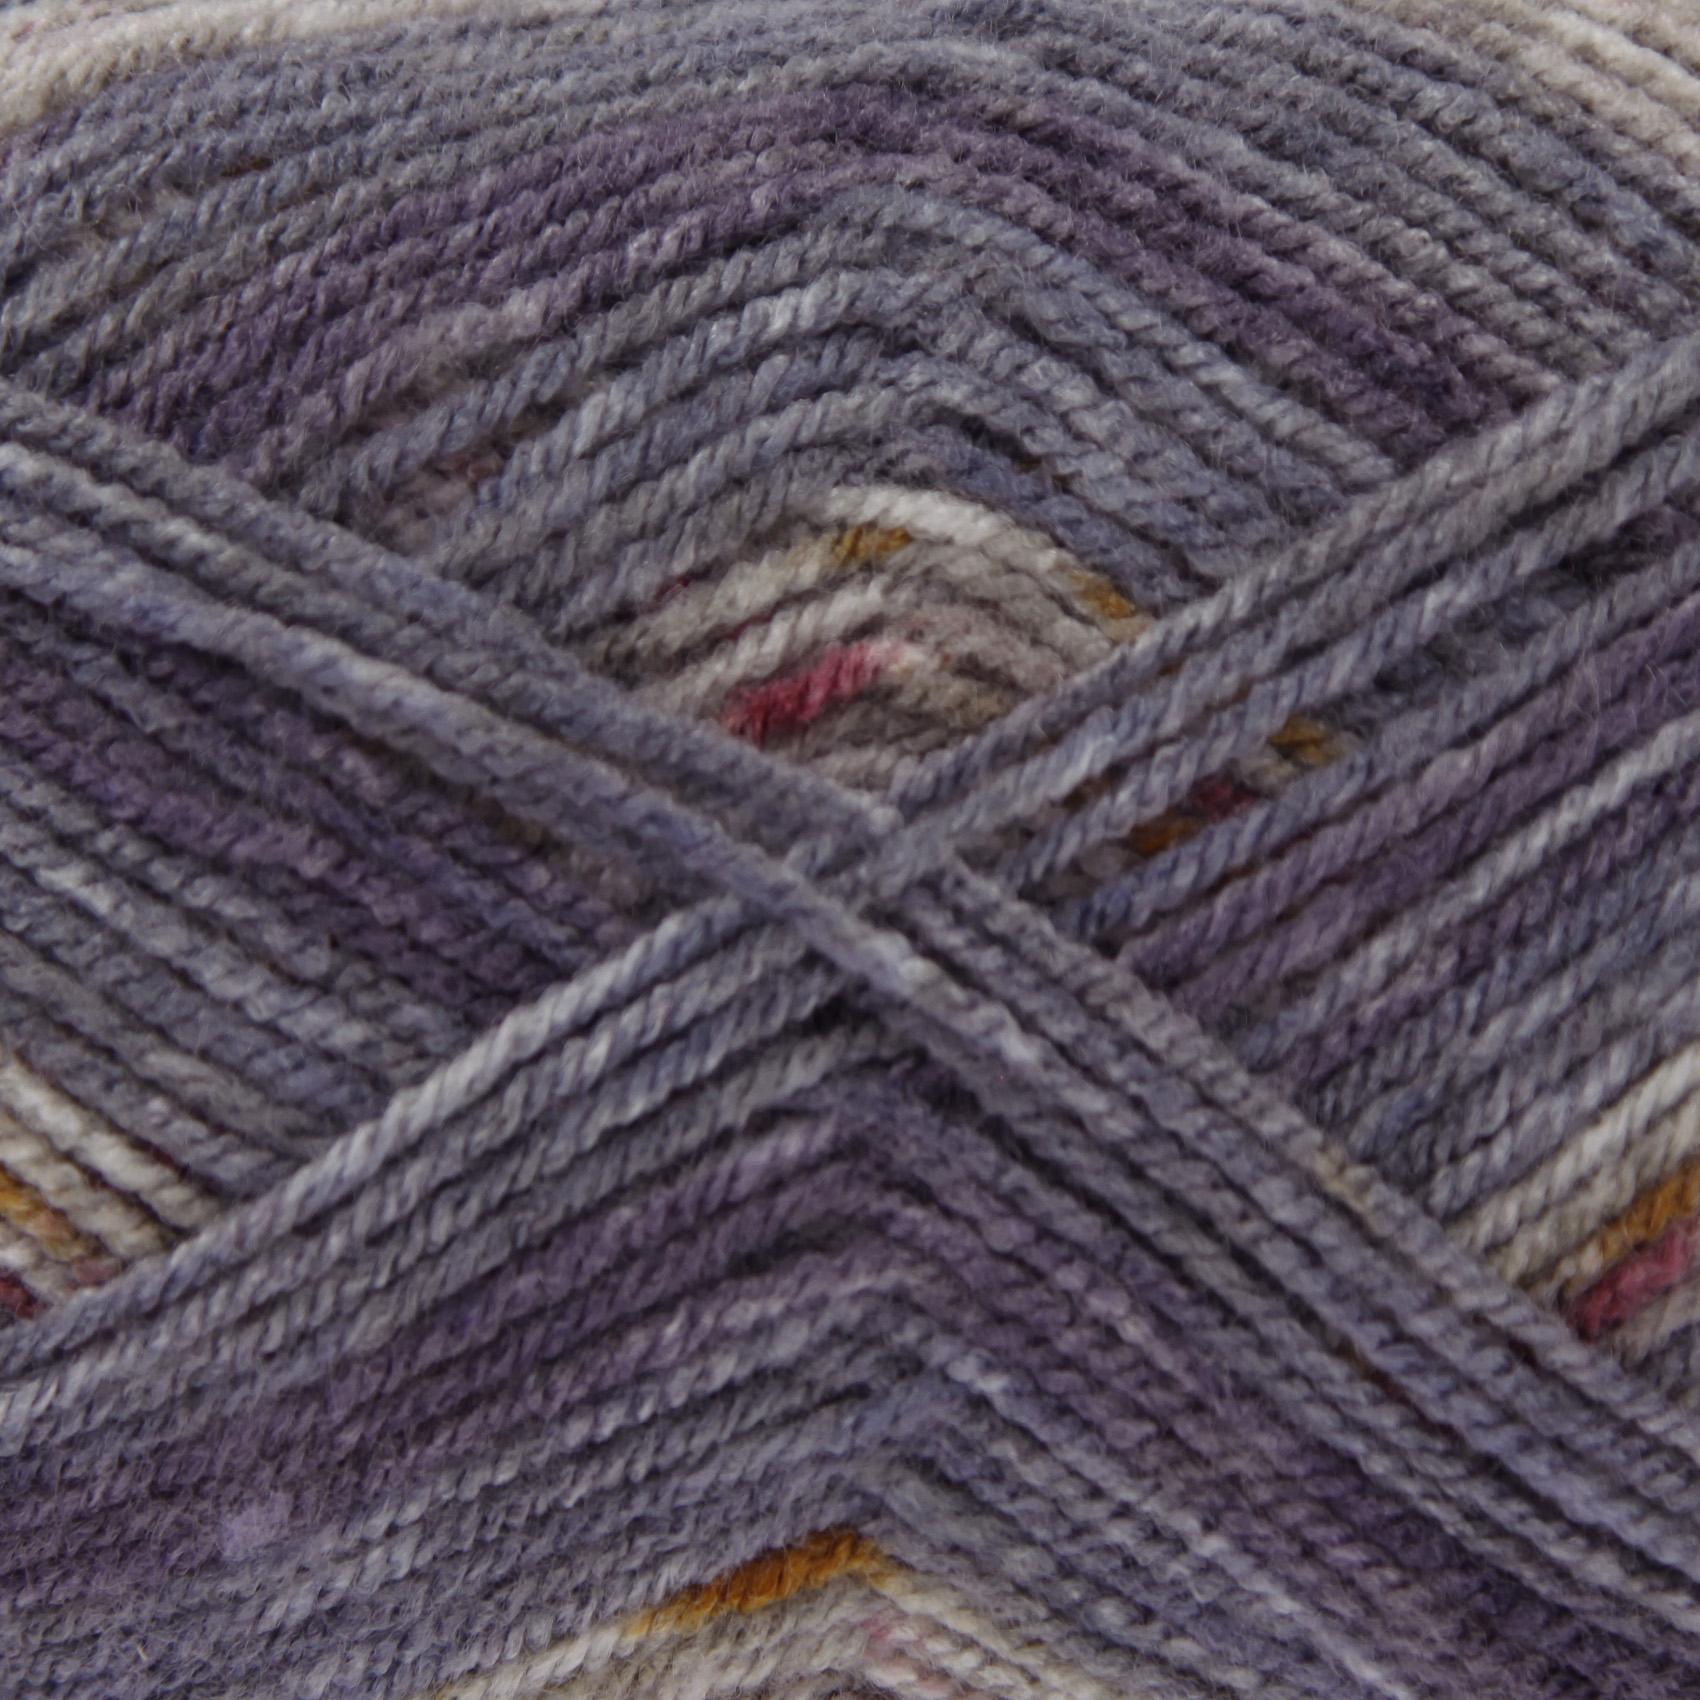 Knitting Patterns Double Knitting Wool : 100% Premium Acrylic Soft Double Knitting DK Wool 100g Splash King Cole Yarn ...